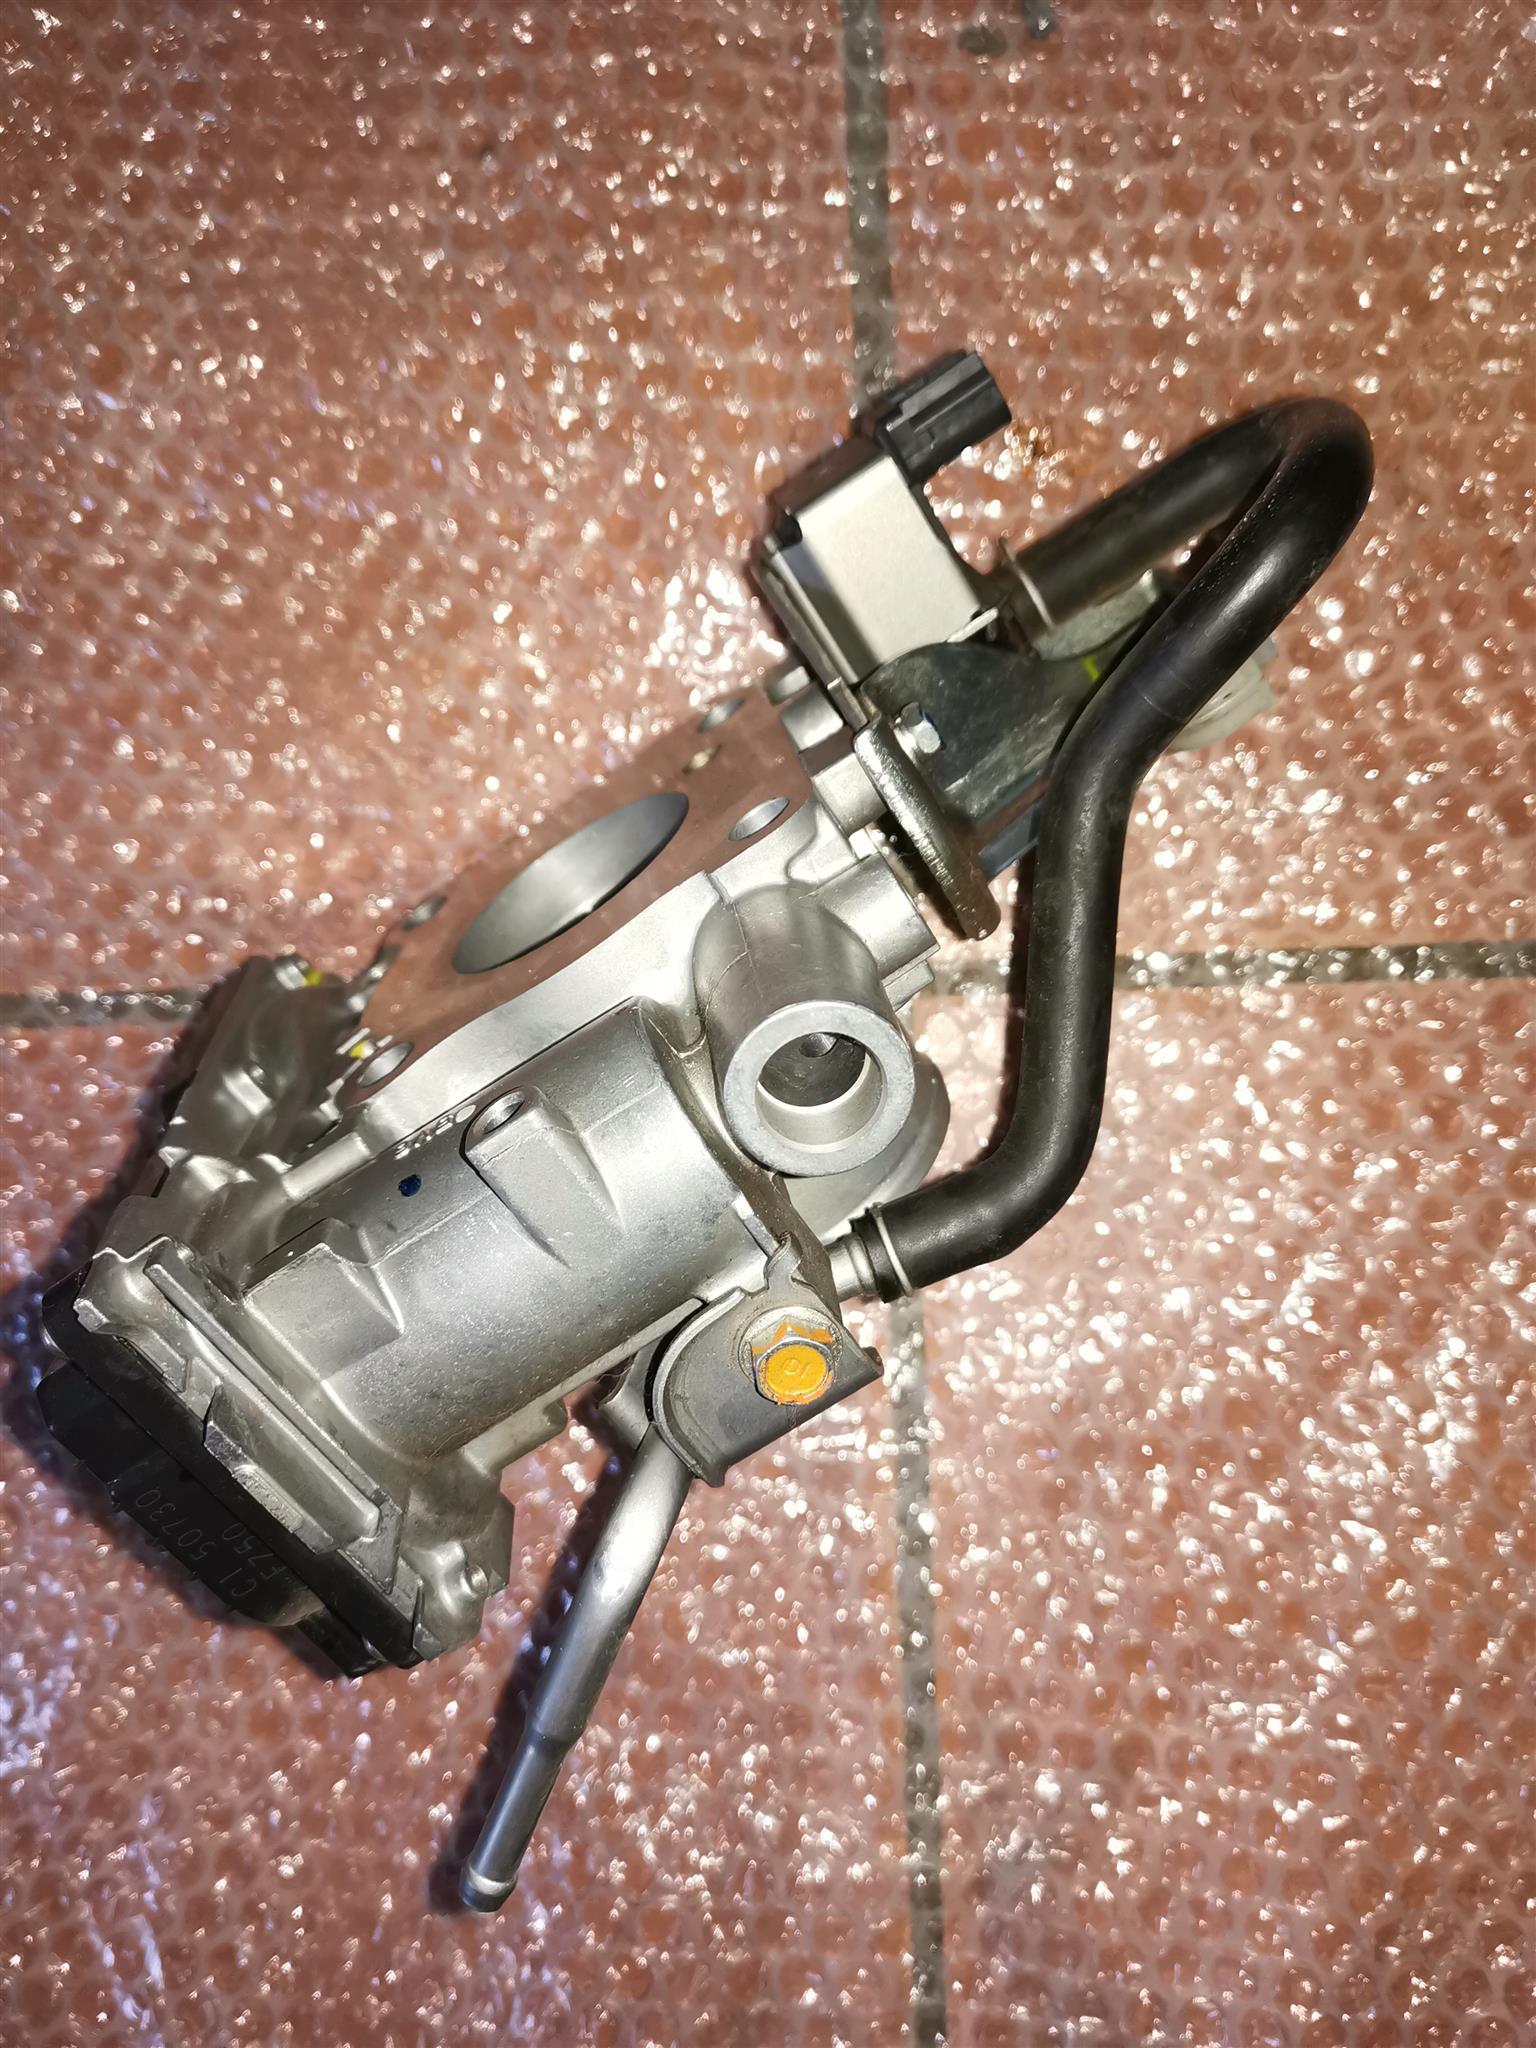 HONDA Brio 1.2L Electronic Throttle body Valve